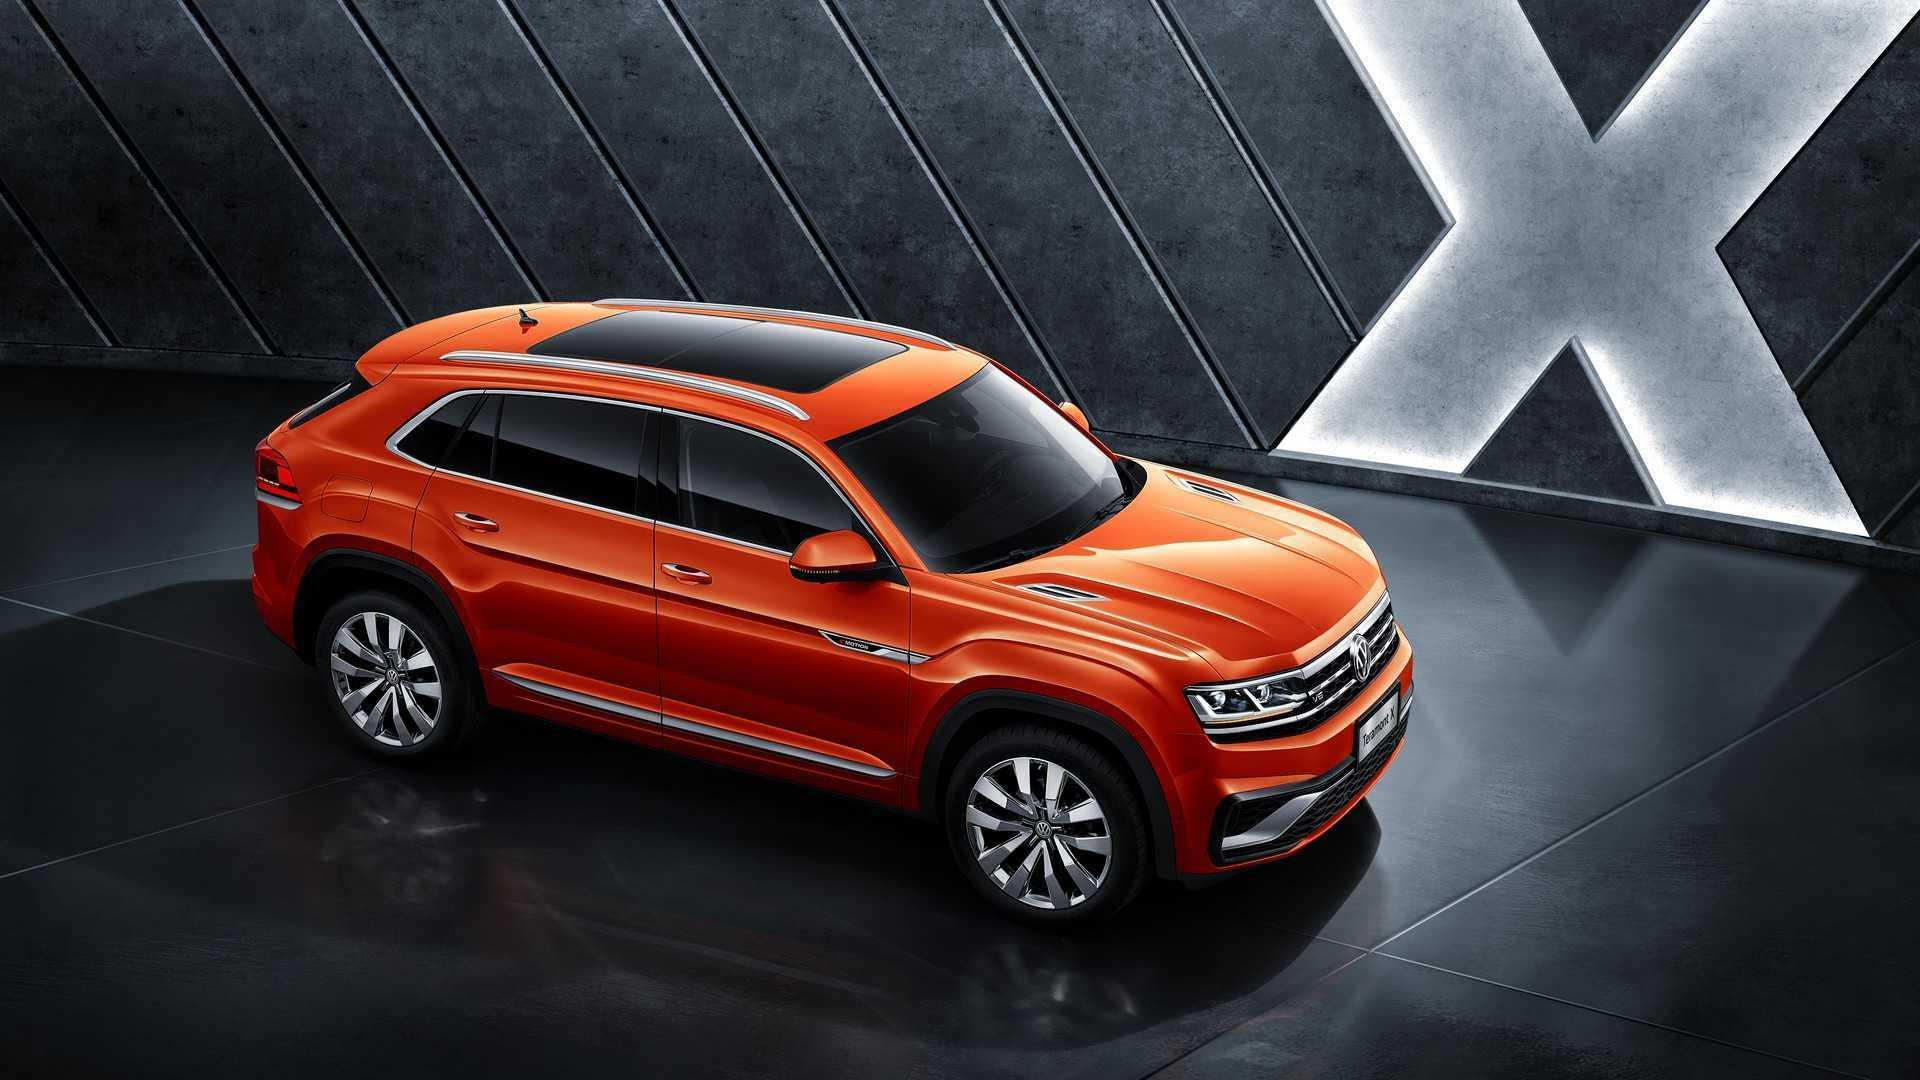 62 Gallery of 2020 Volkswagen Teramont X Overview by 2020 Volkswagen Teramont X